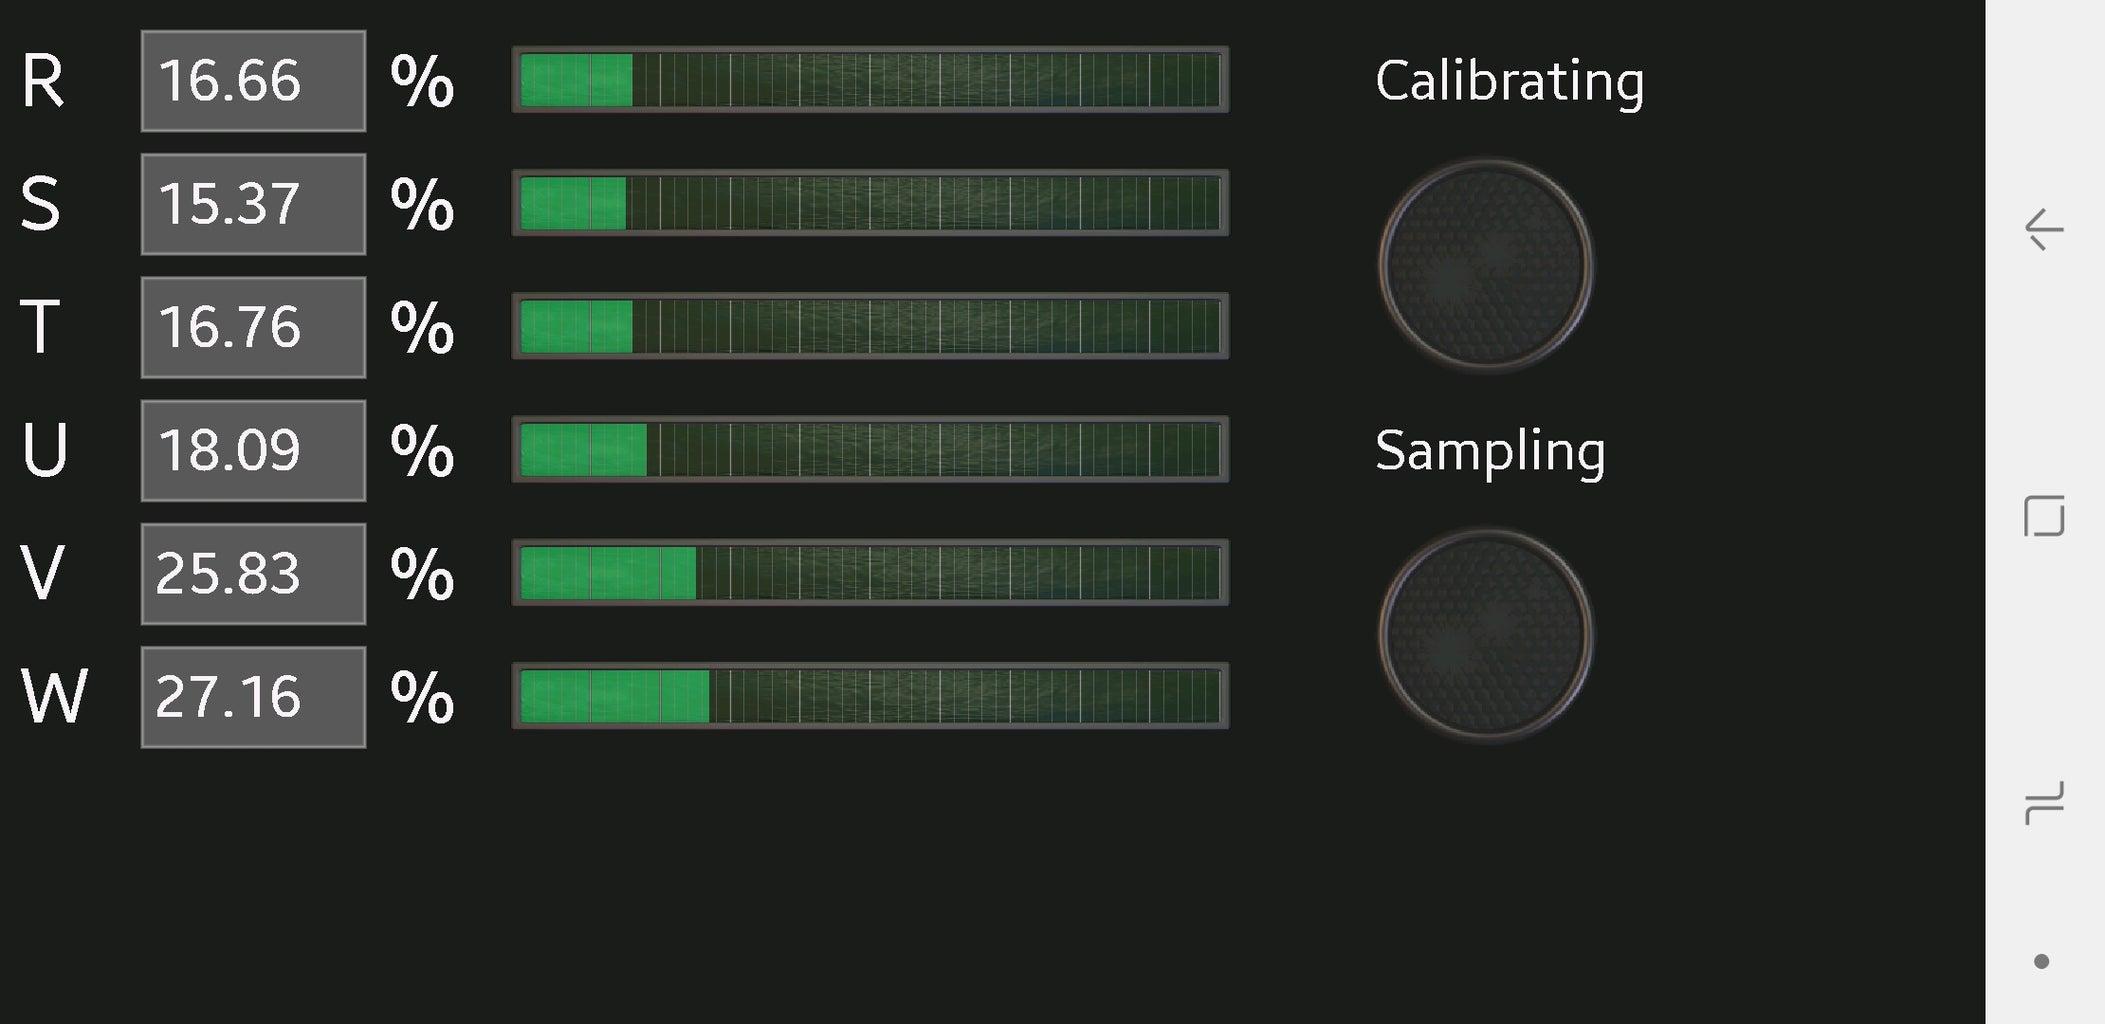 Displaying Results Through Bluetooth